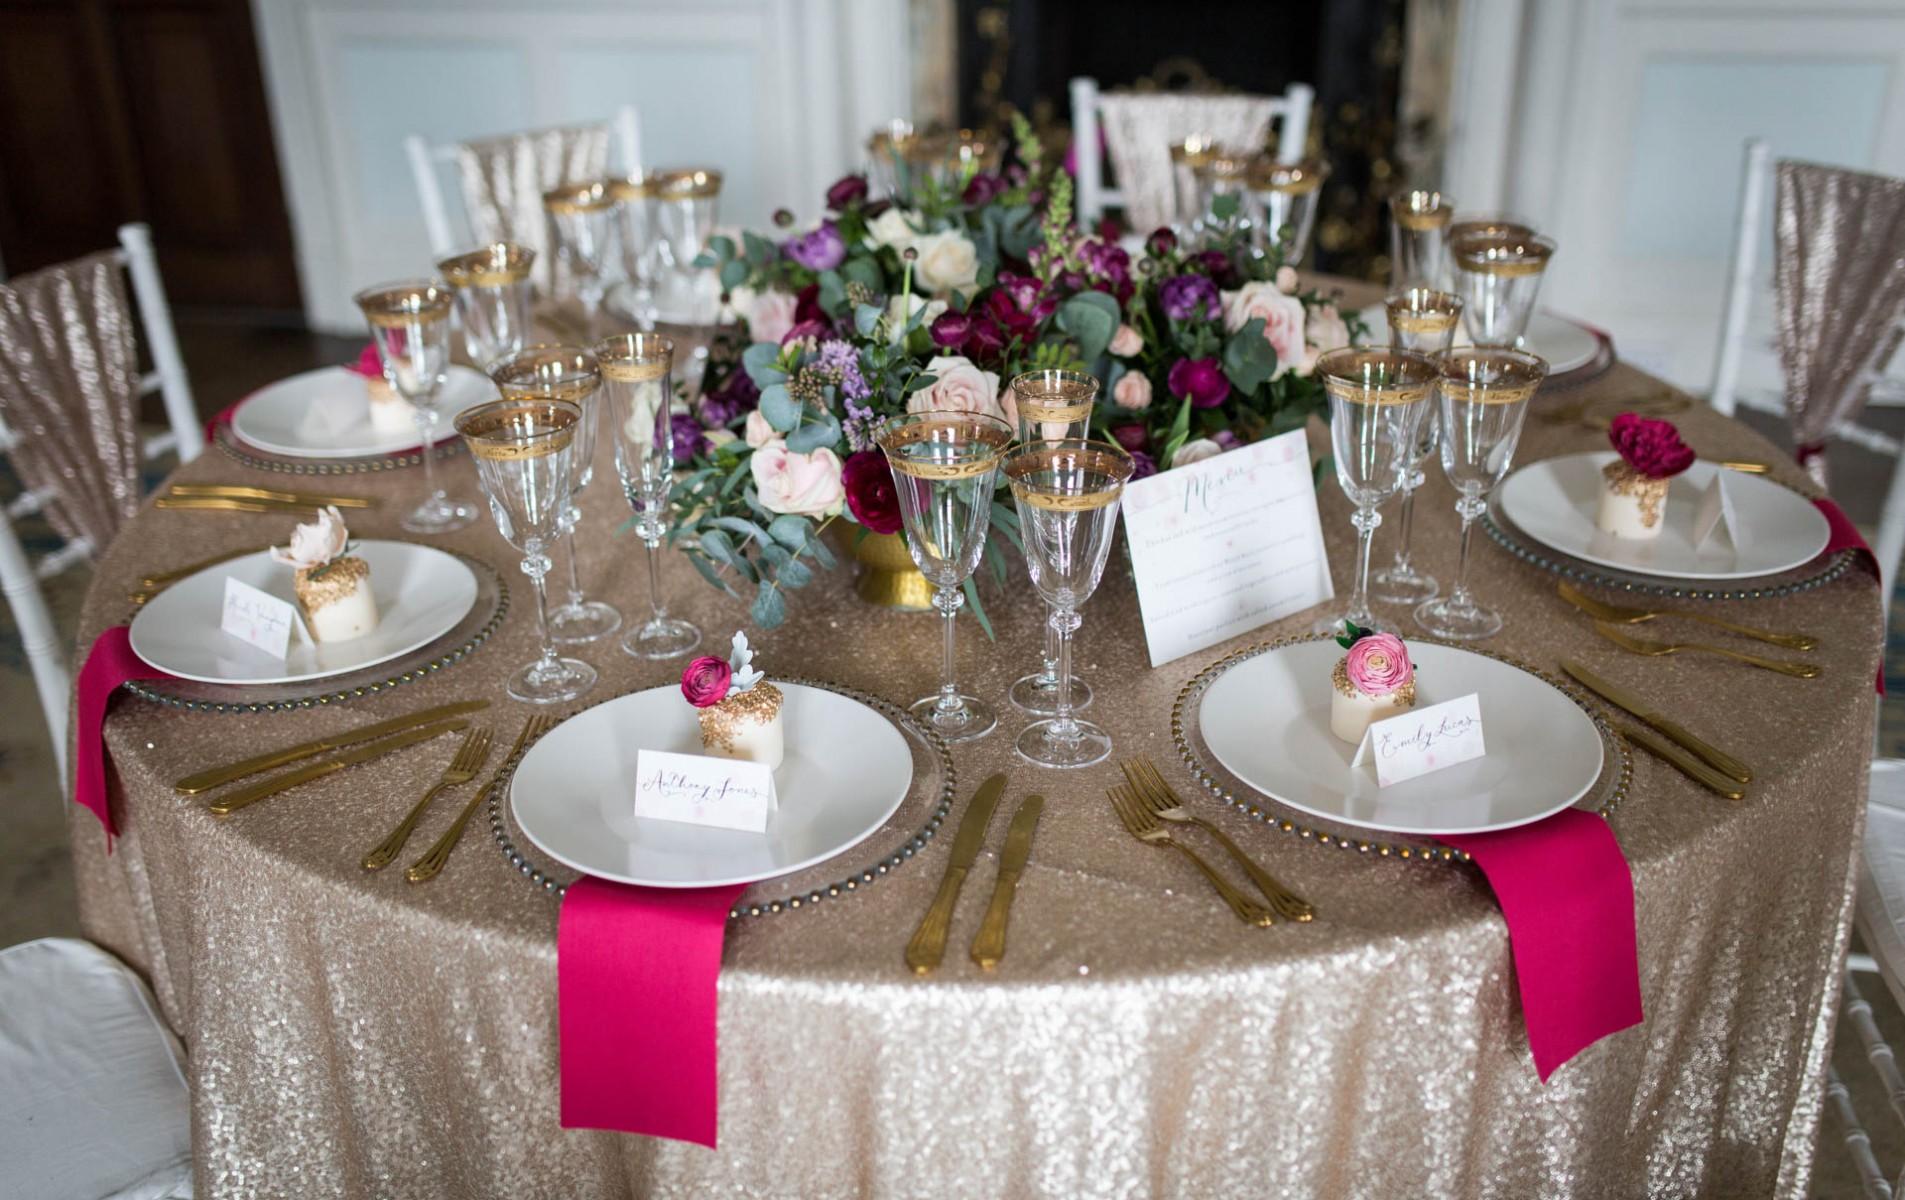 Poundon House - The Luxury Bridal Experience